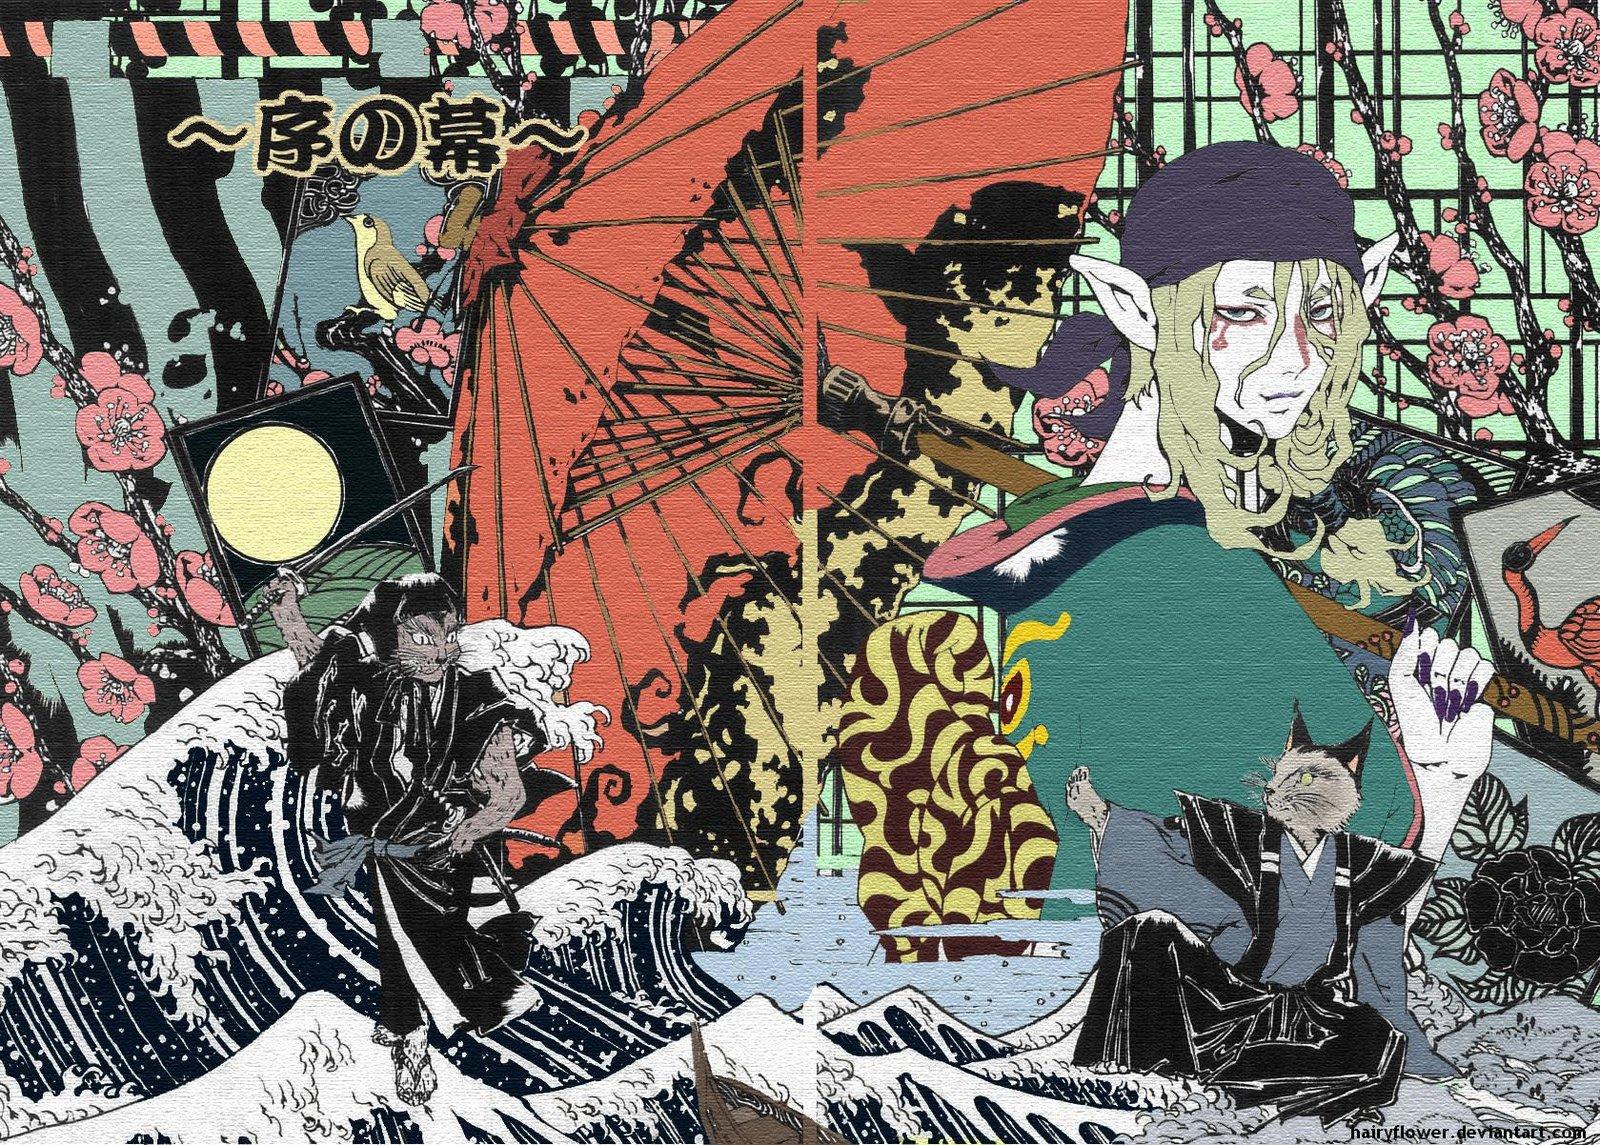 Чудовища и существа Японии. Мононокэ, аякаси